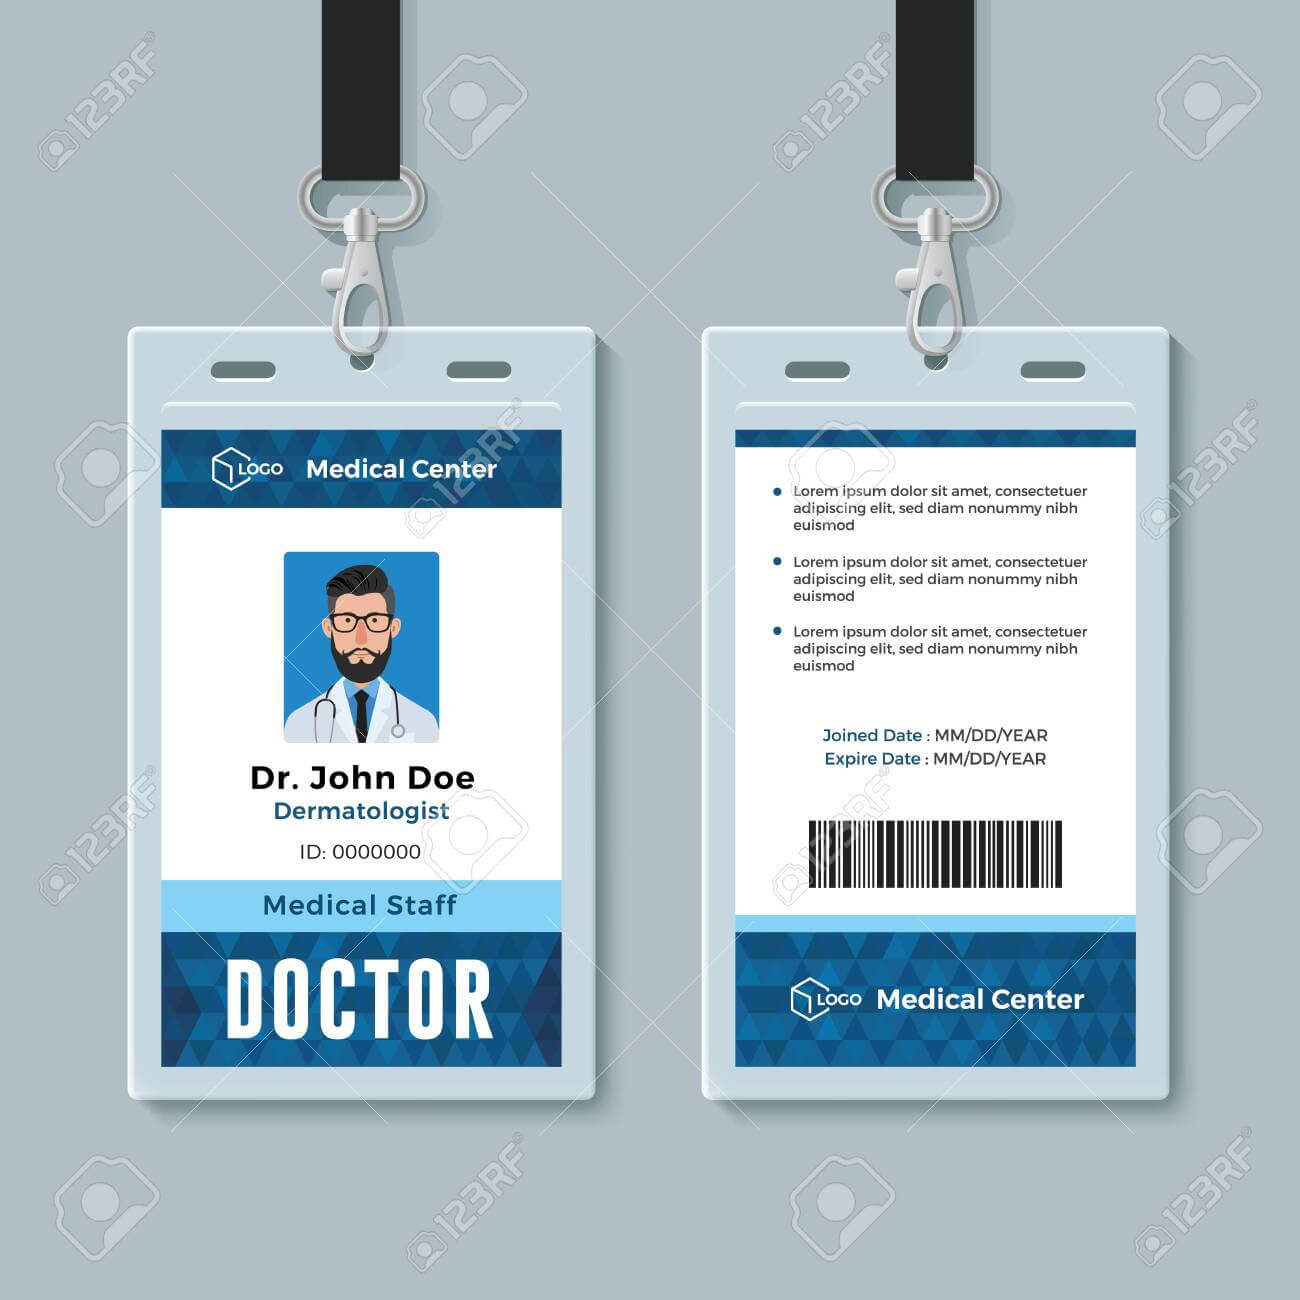 Doctor Id Card. Medical Identity Badge Design Template within Doctor Id Card Template